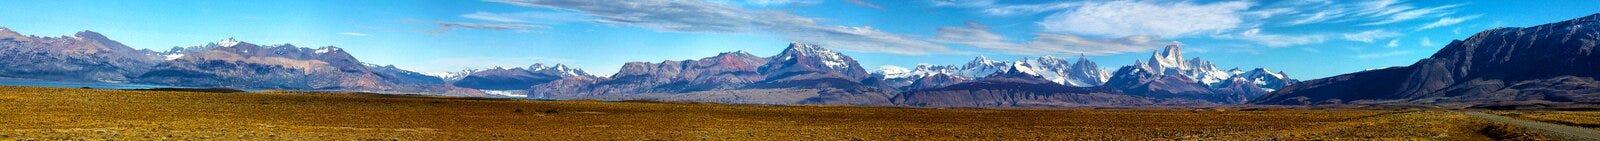 Panorama de Fitz Roy, Patagonia, Argentina Imagens de Stock Royalty Free